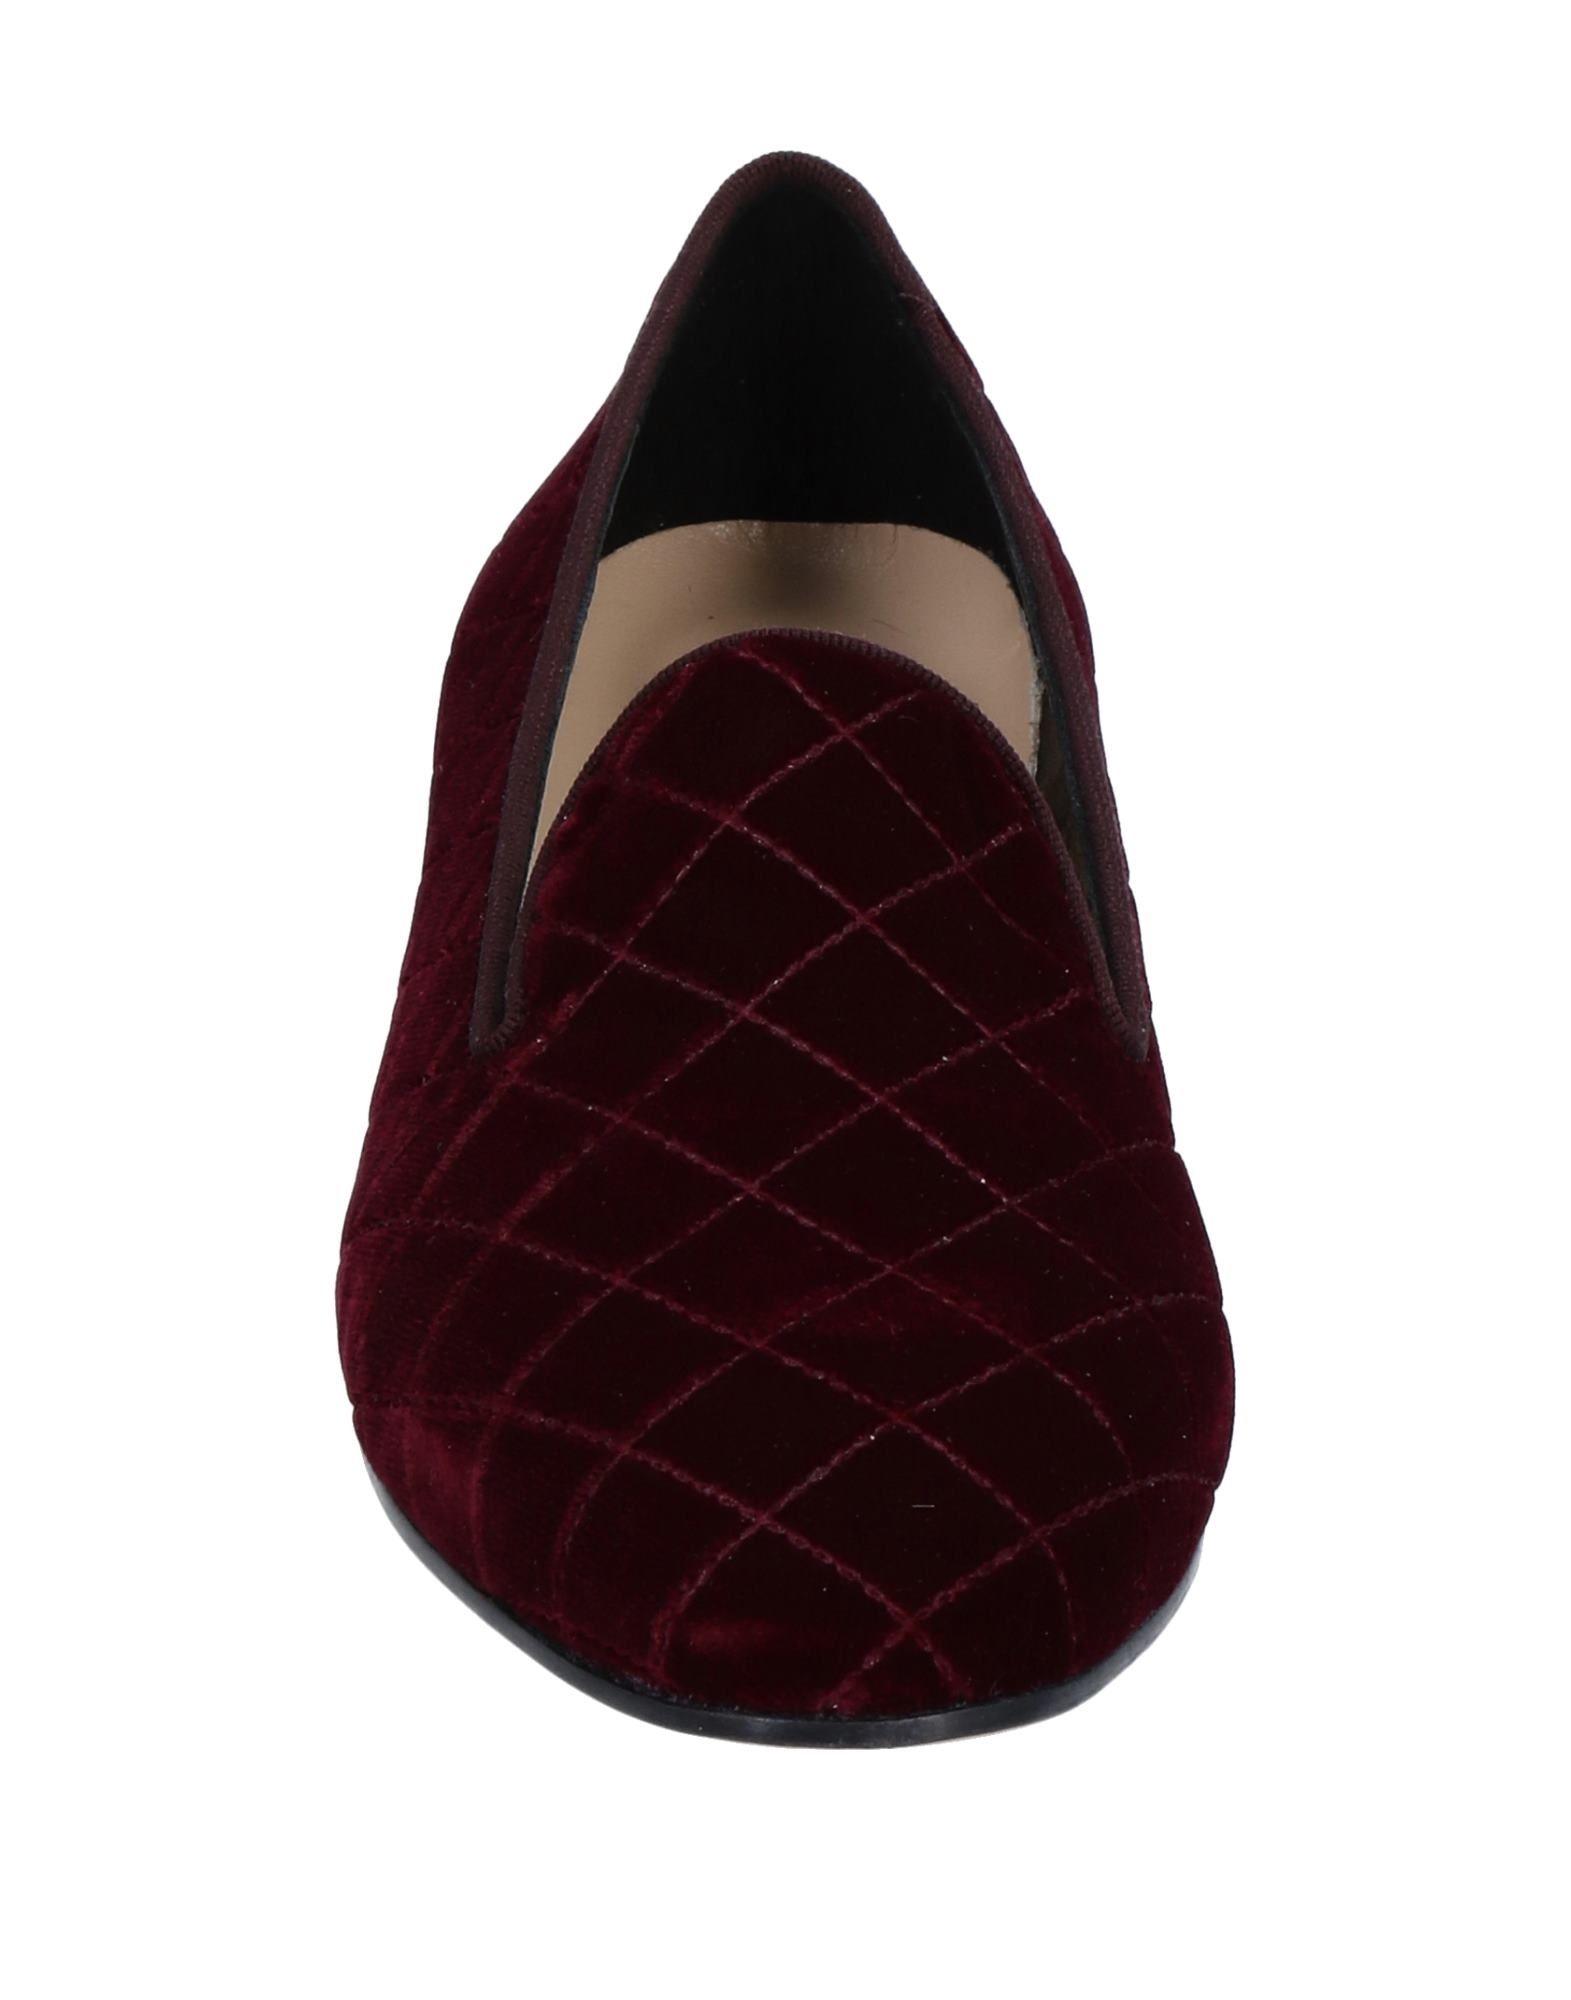 Fabio 11532312JL Rusconi Mokassins Damen  11532312JL Fabio Gute Qualität beliebte Schuhe b21367